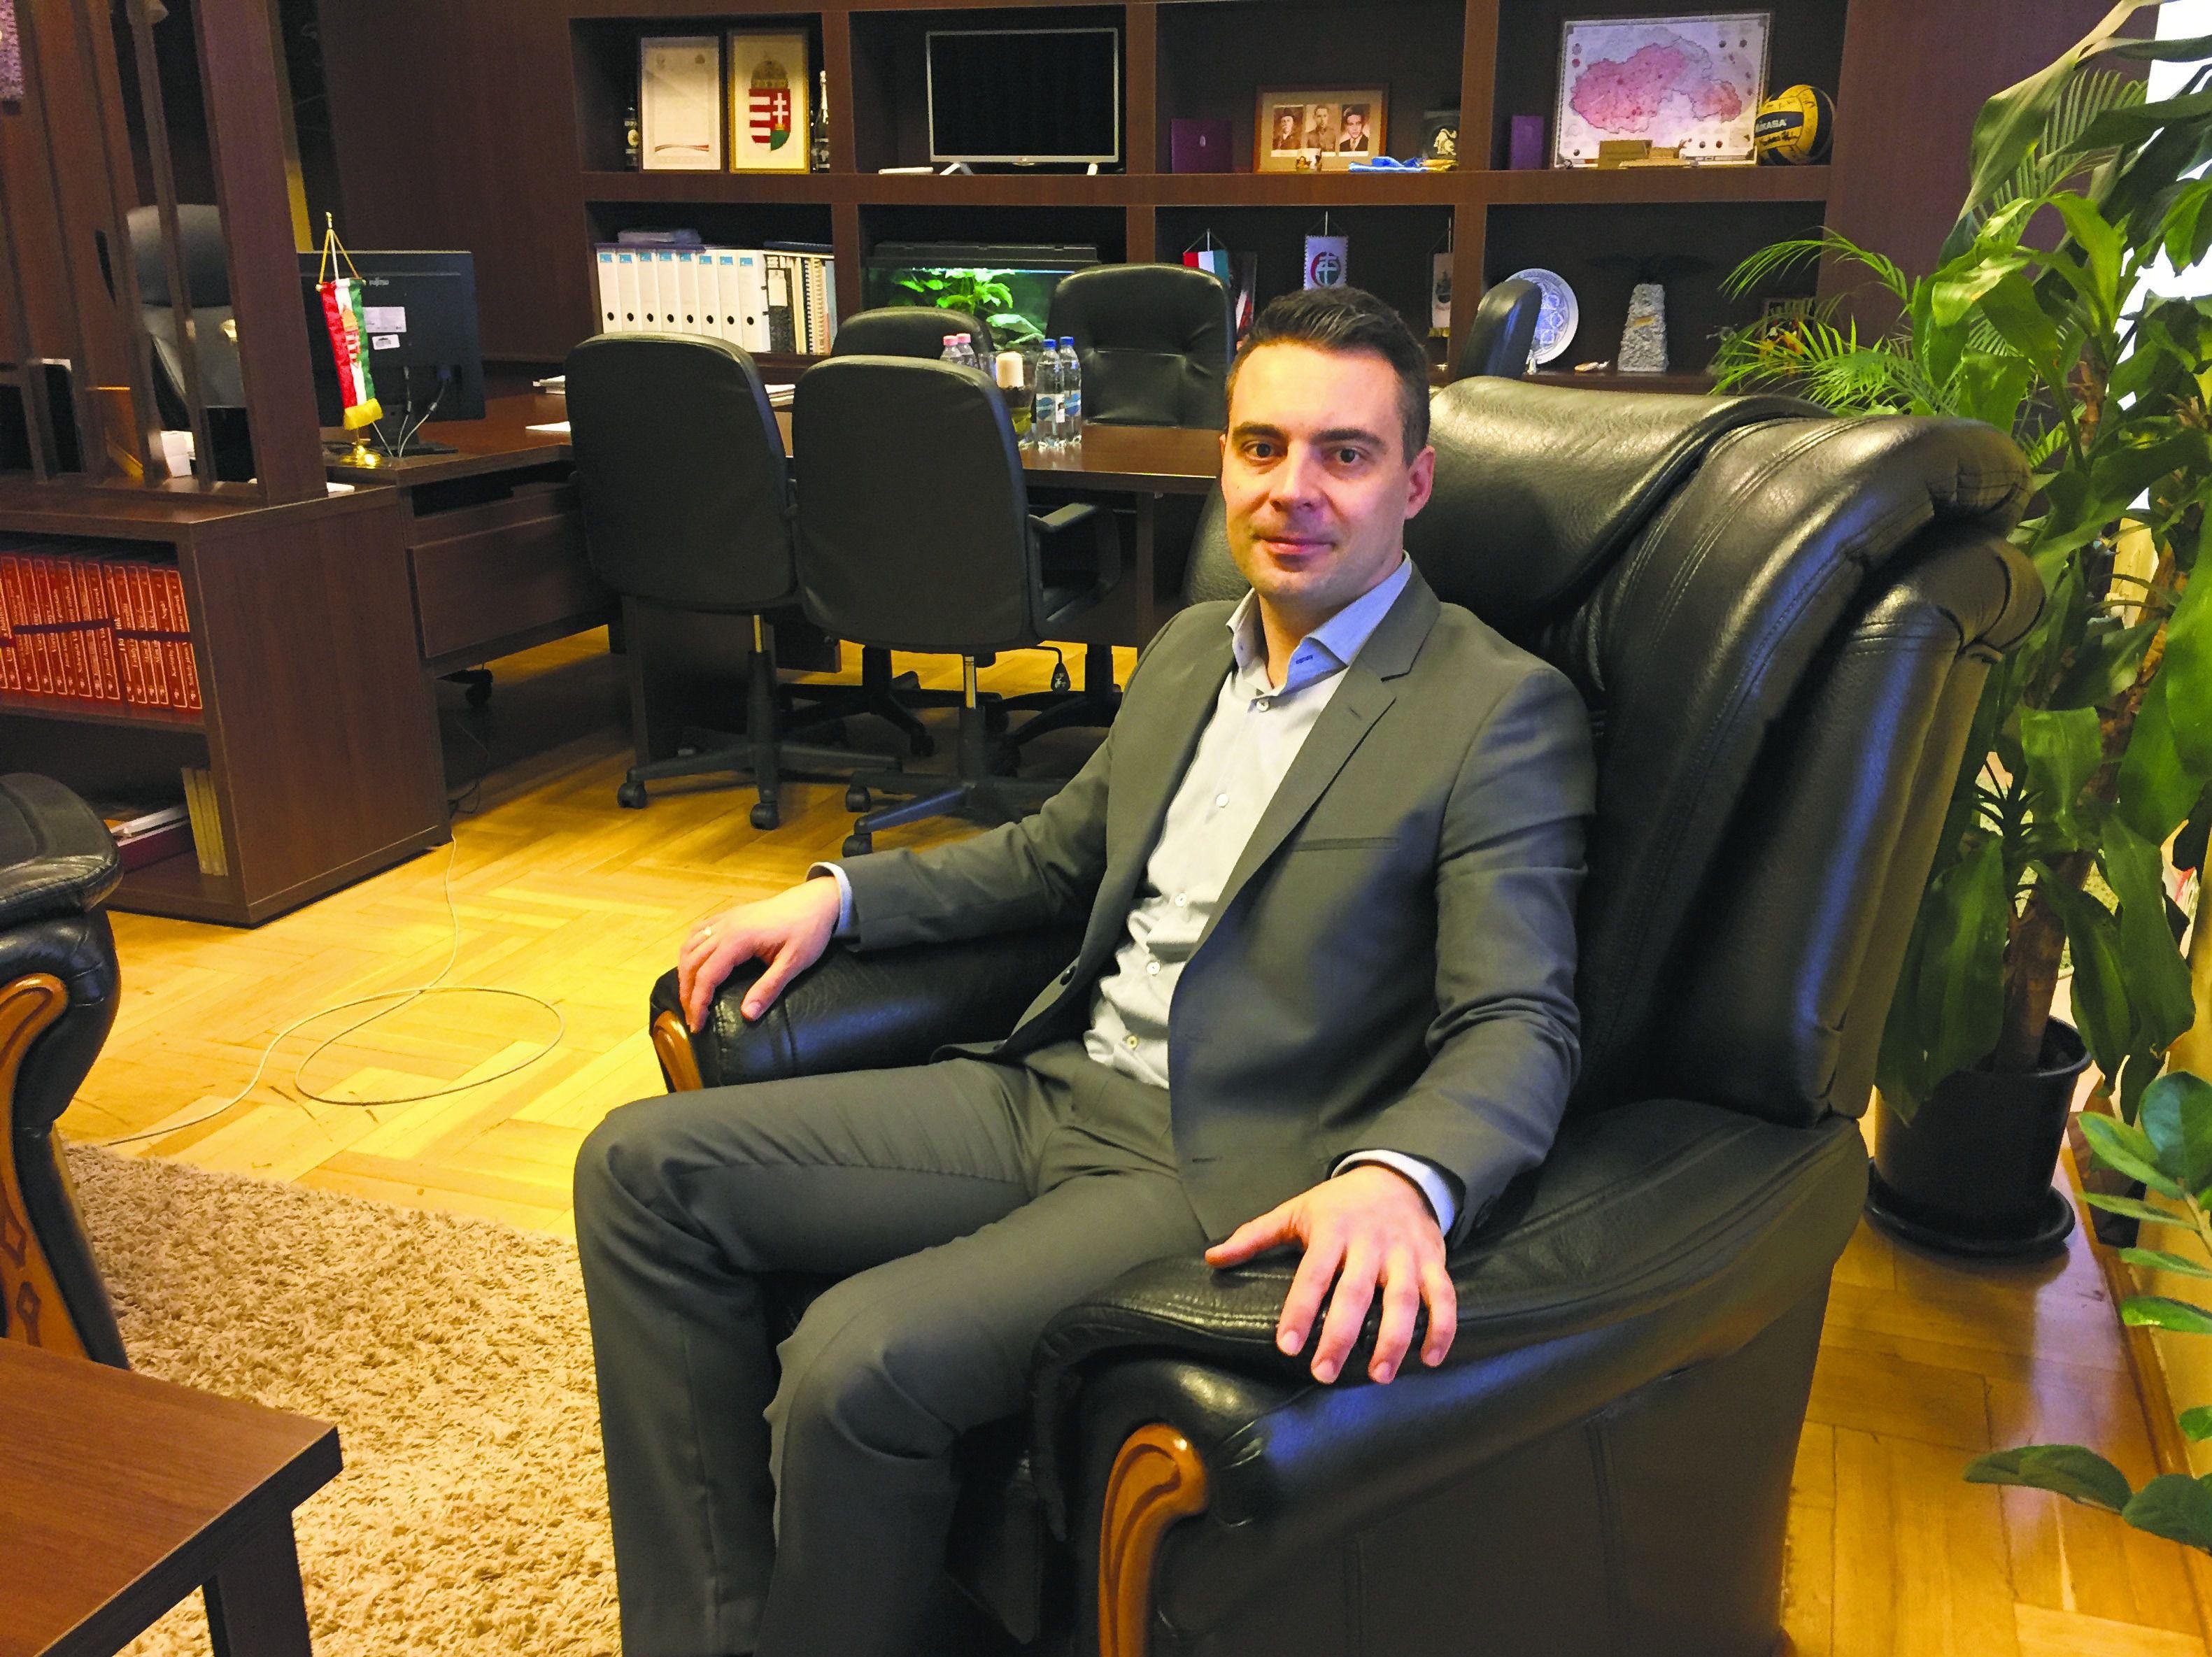 Exclusive Hungarys Far Right Leader Gabor Vona Of Jobbik In